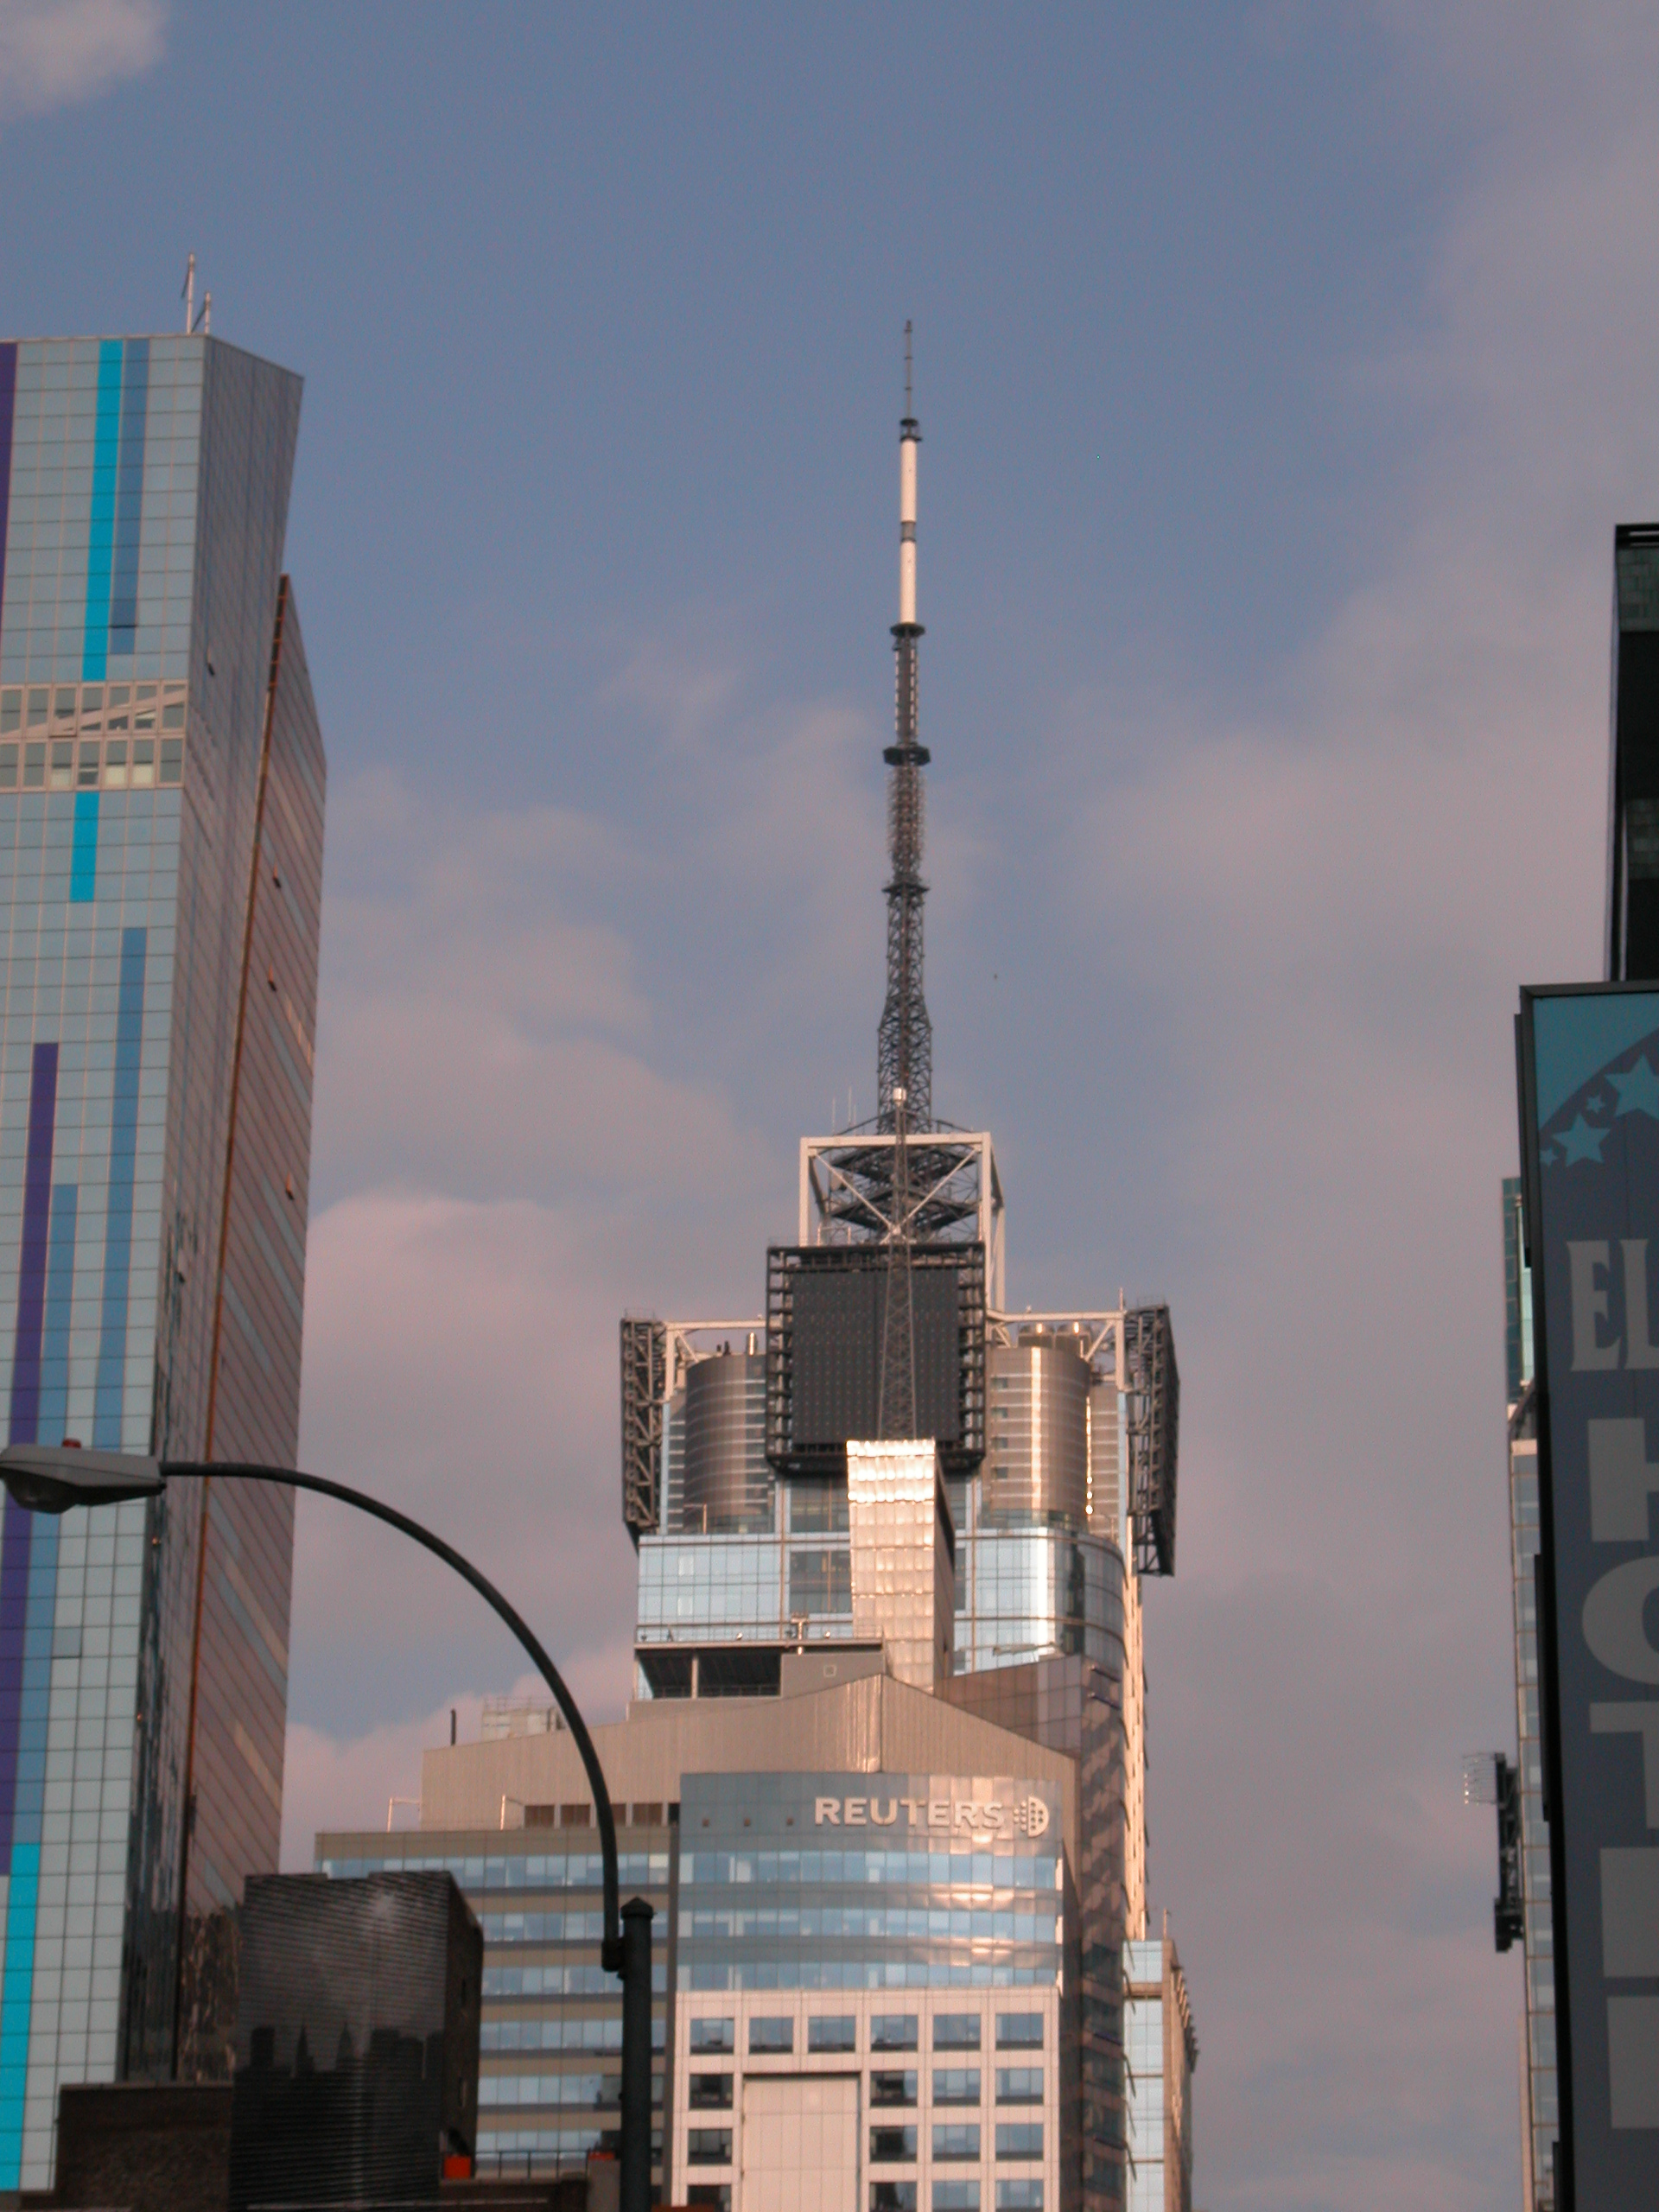 cond u00e9 nast building in new york city  ny  usa  1920 u00d72560    architectureporn